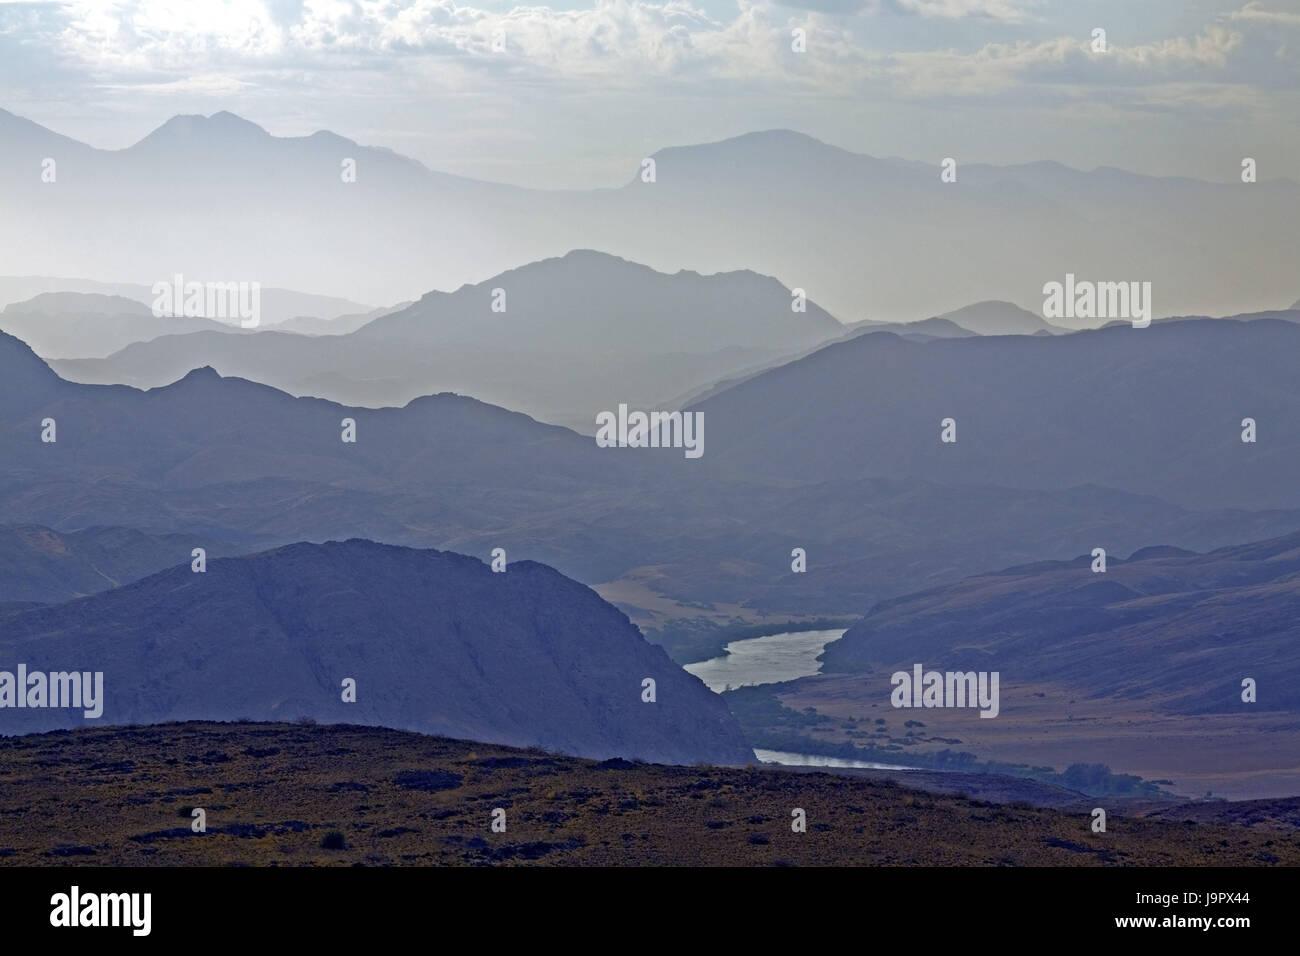 South-West Africa,Namibia,Kunene region,Hartmann,Kunene flux,border flux,mountain landscape,Angola,beautyful clouds, - Stock Image